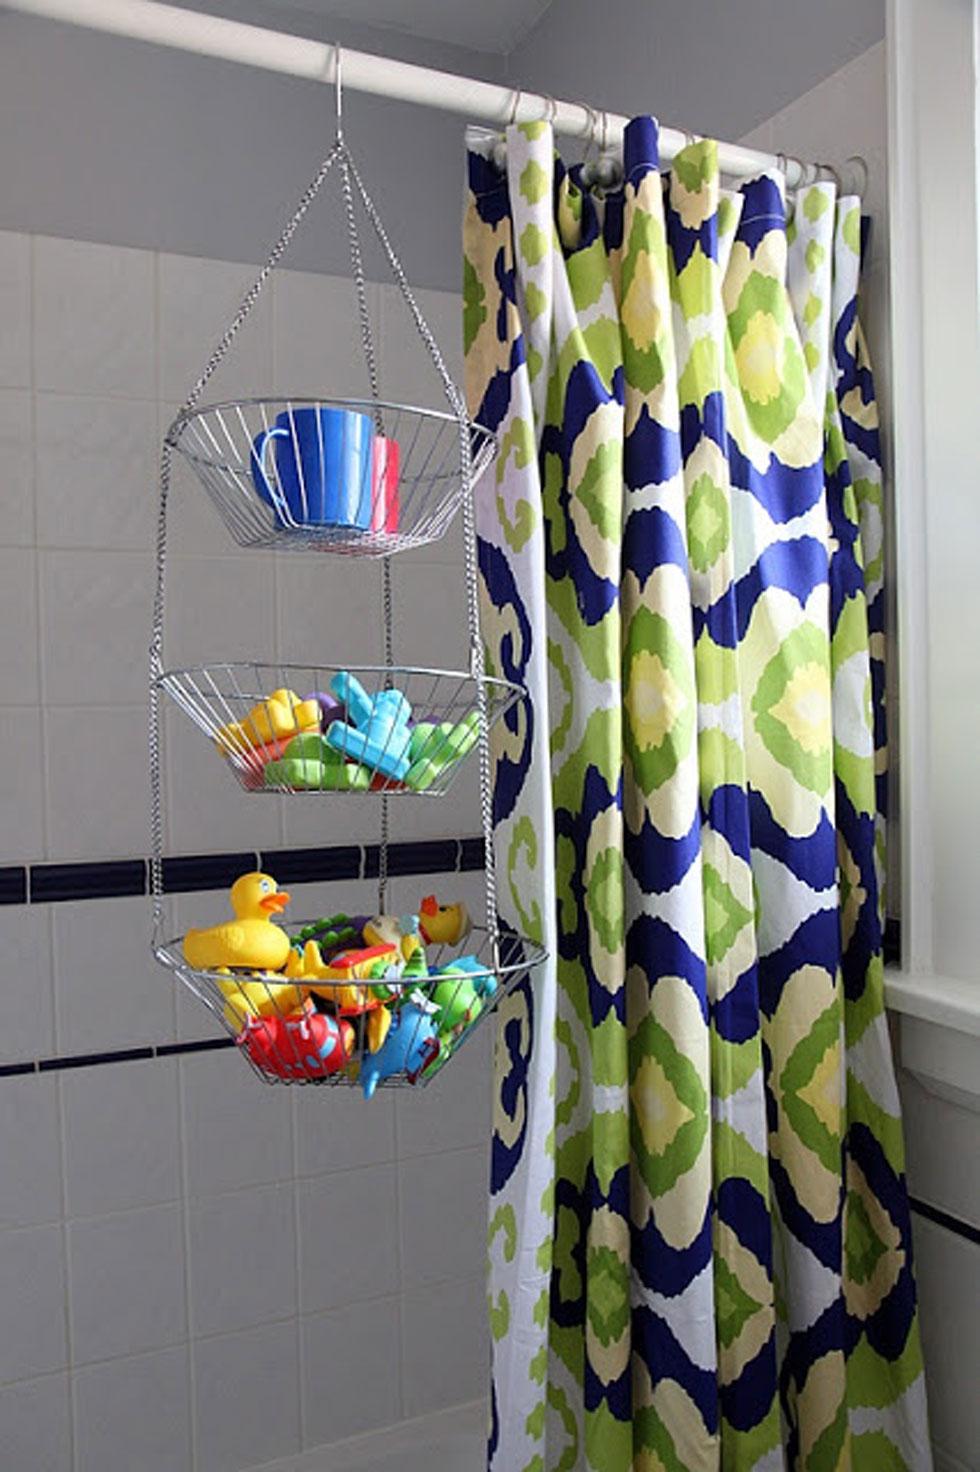 Bathroom Toys Storage Toy Organization Ideas Smart Storage Ideas